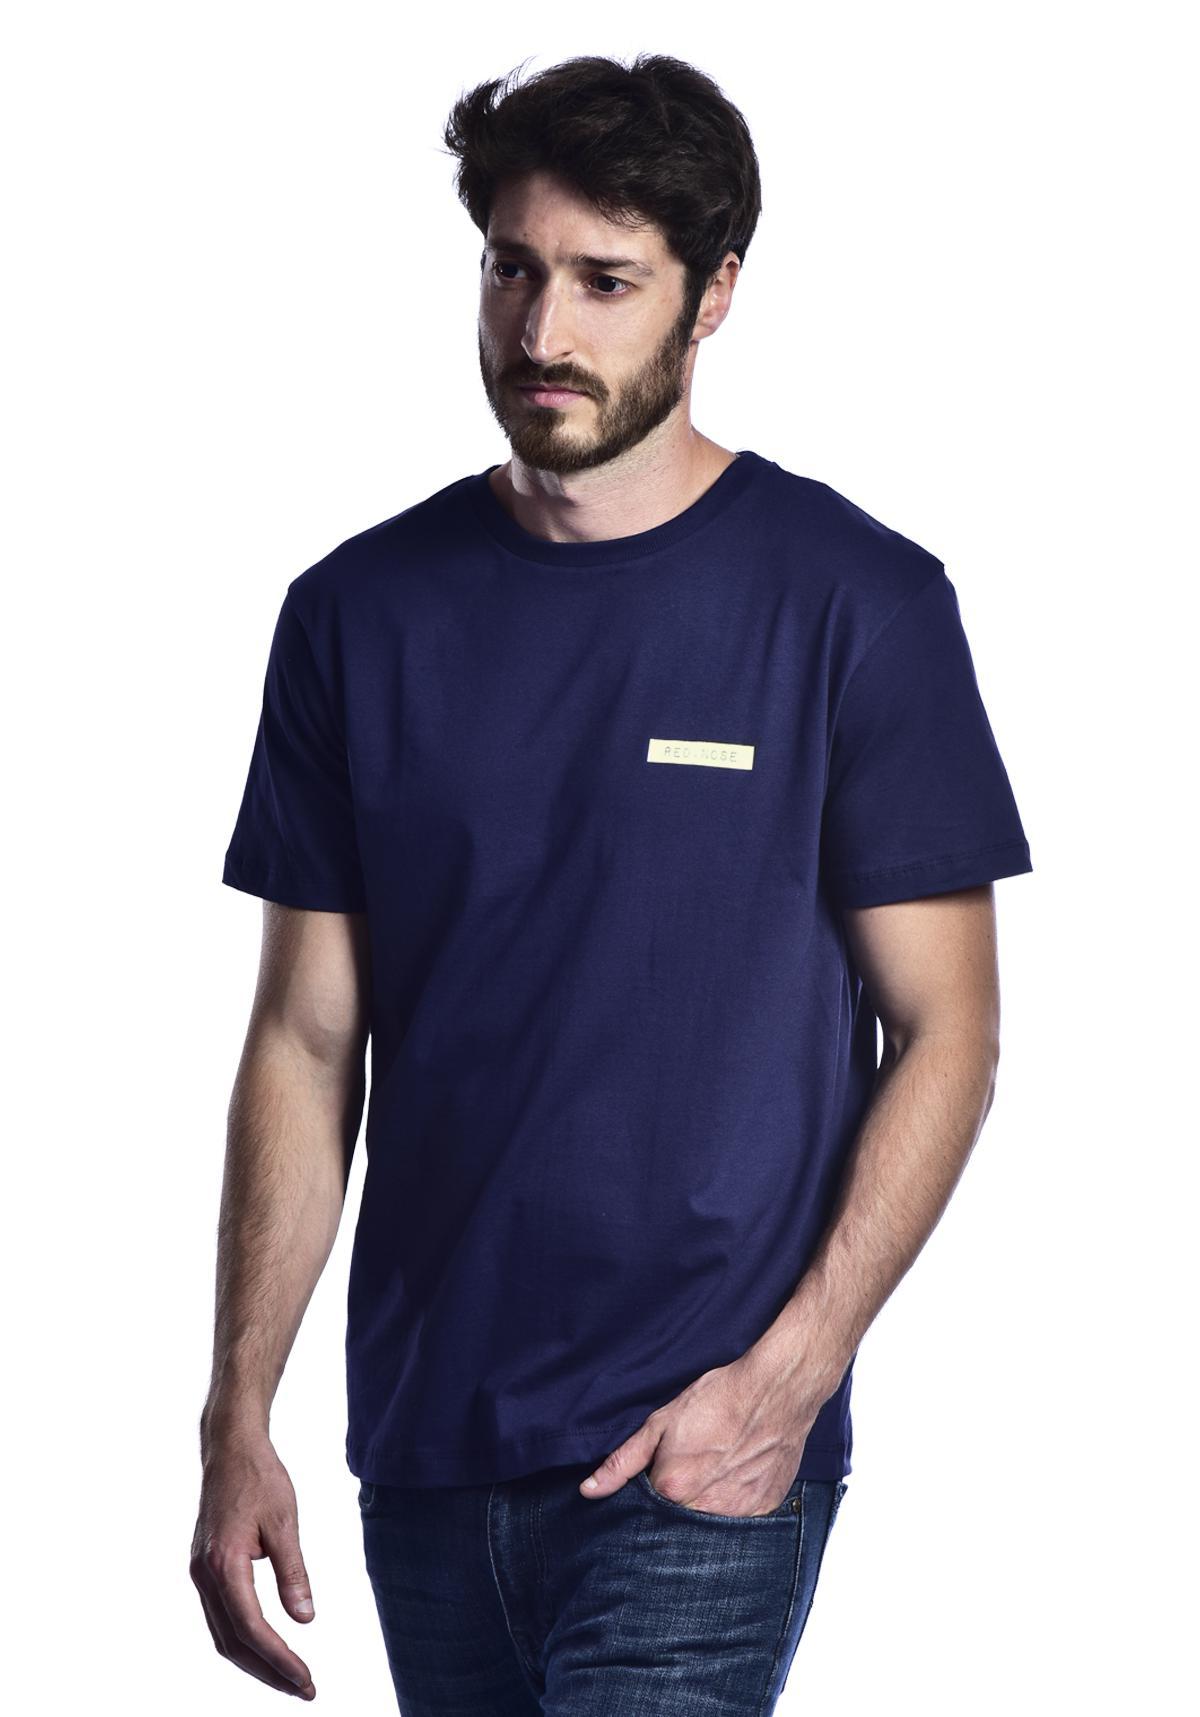 Camiseta Red Nose Etiqueta - Azul Marinho P